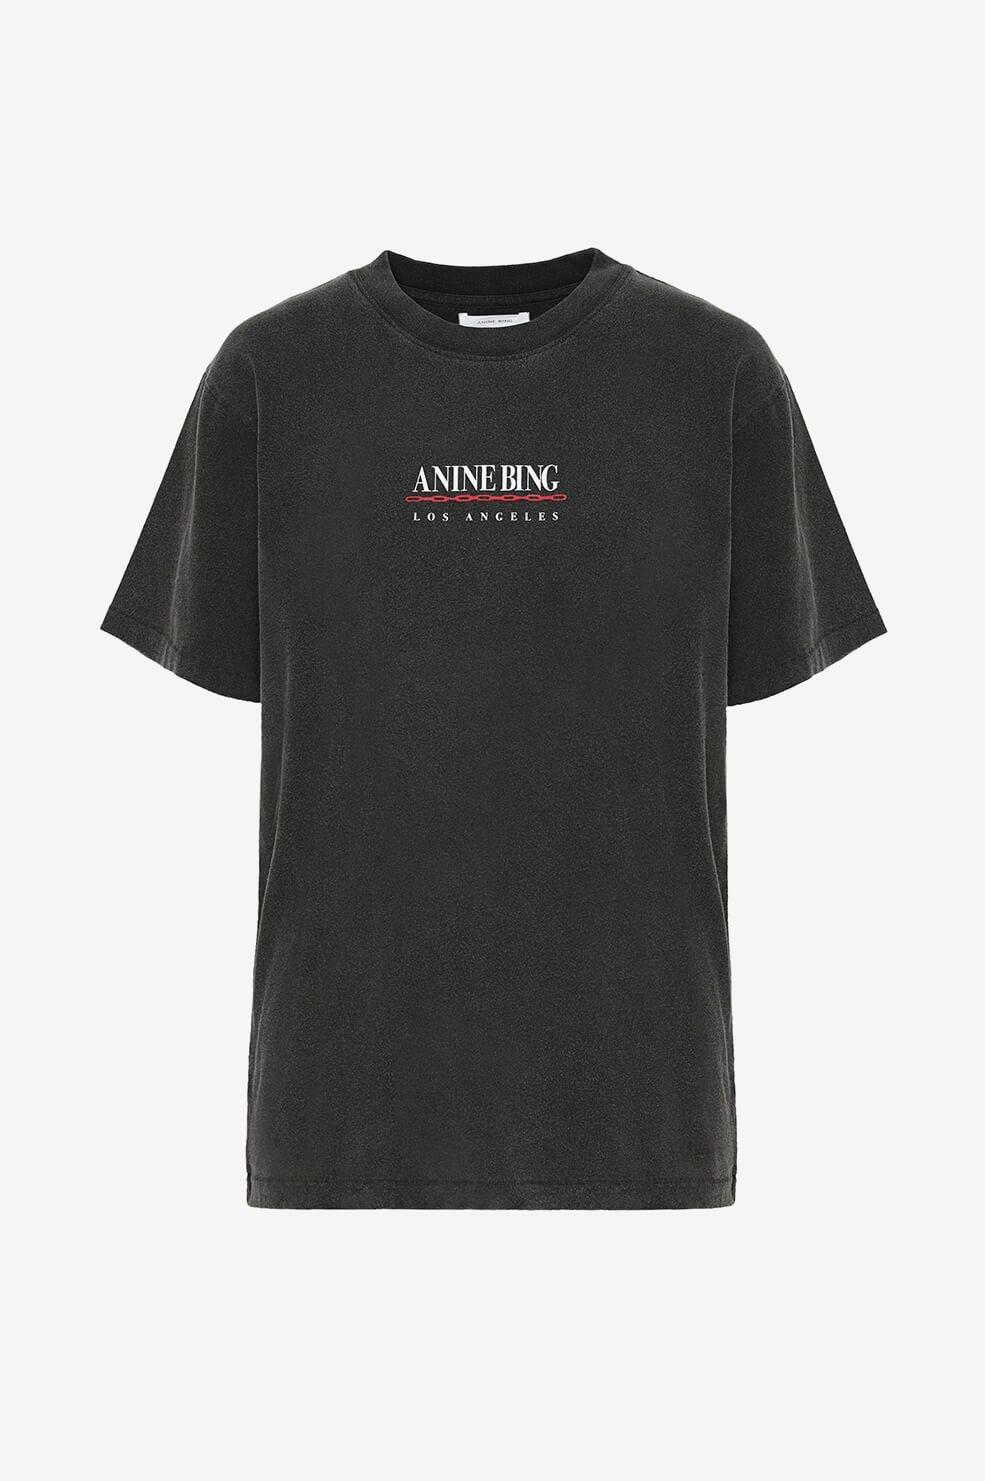 ANINE BING t-shirt lili link-1